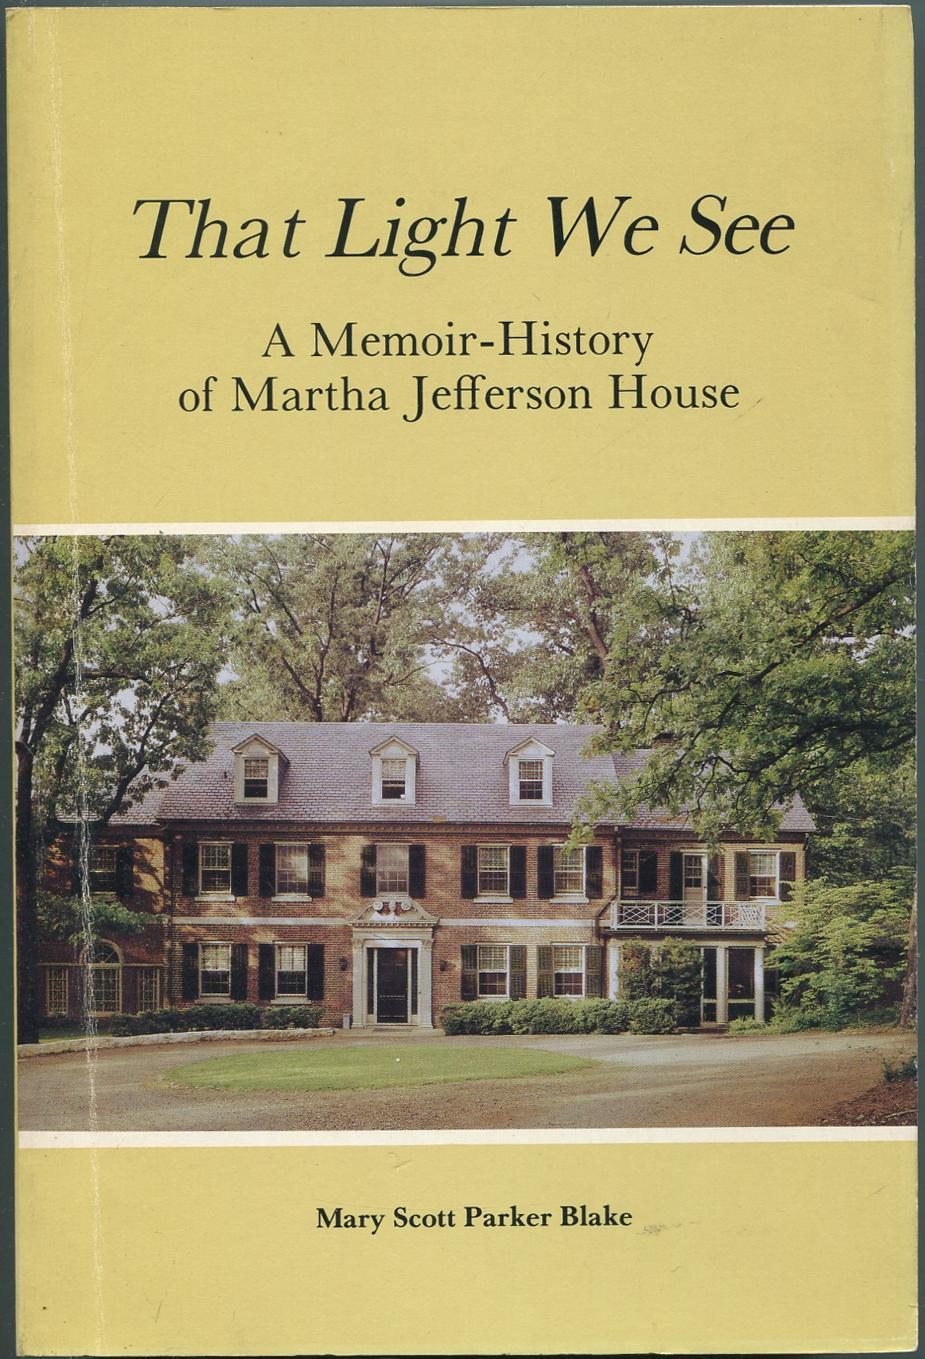 That_Light_We_See_A_MemoirHistory_of_Martha_Jefferson_House_The_First_TwentyFour_Years_19571981_BLAKE_Mary_Scott_Parker_Assez_bon_Couvertur